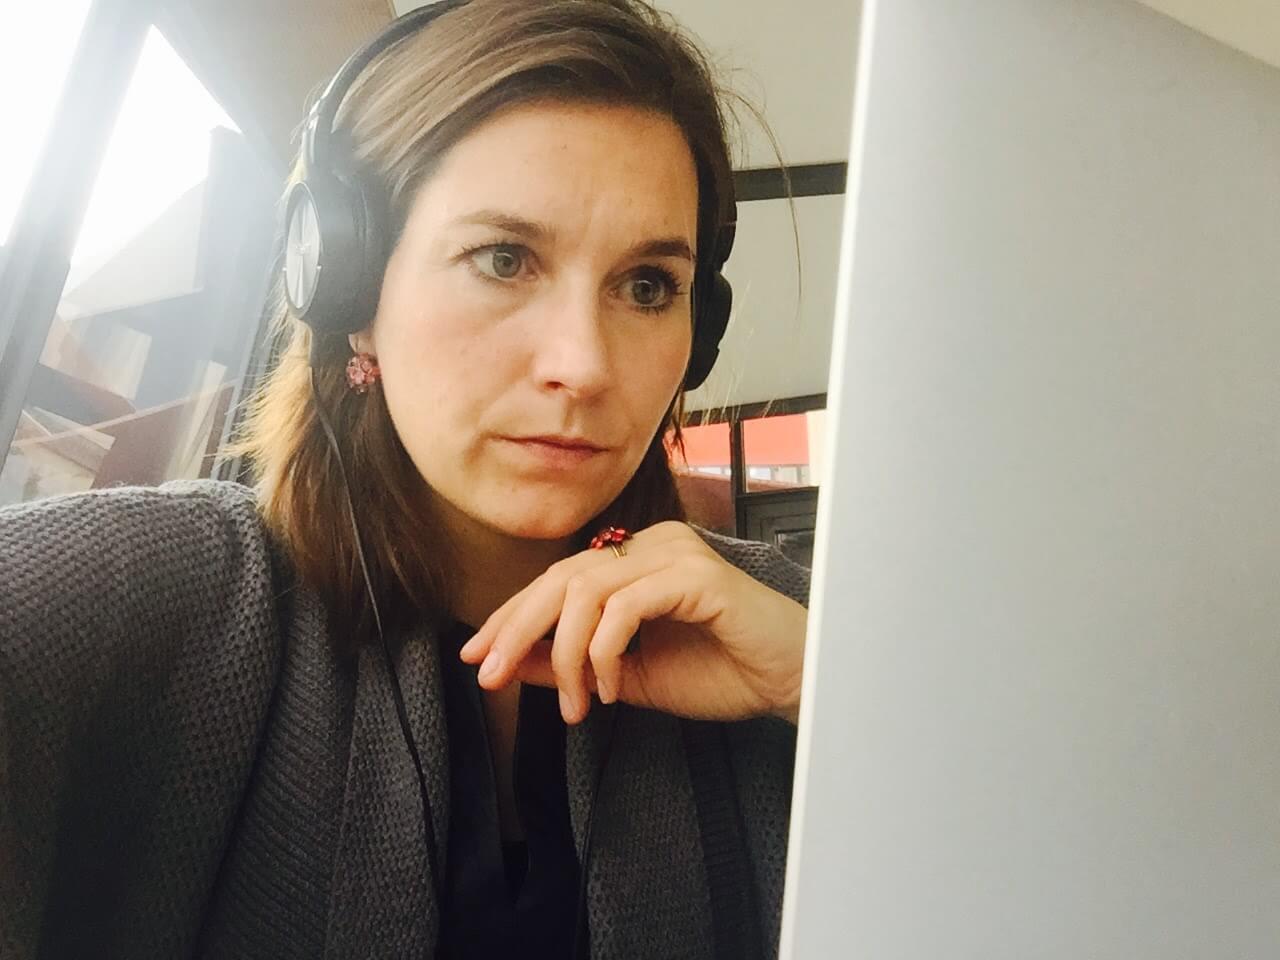 Ulrike Nagel schneidet Video